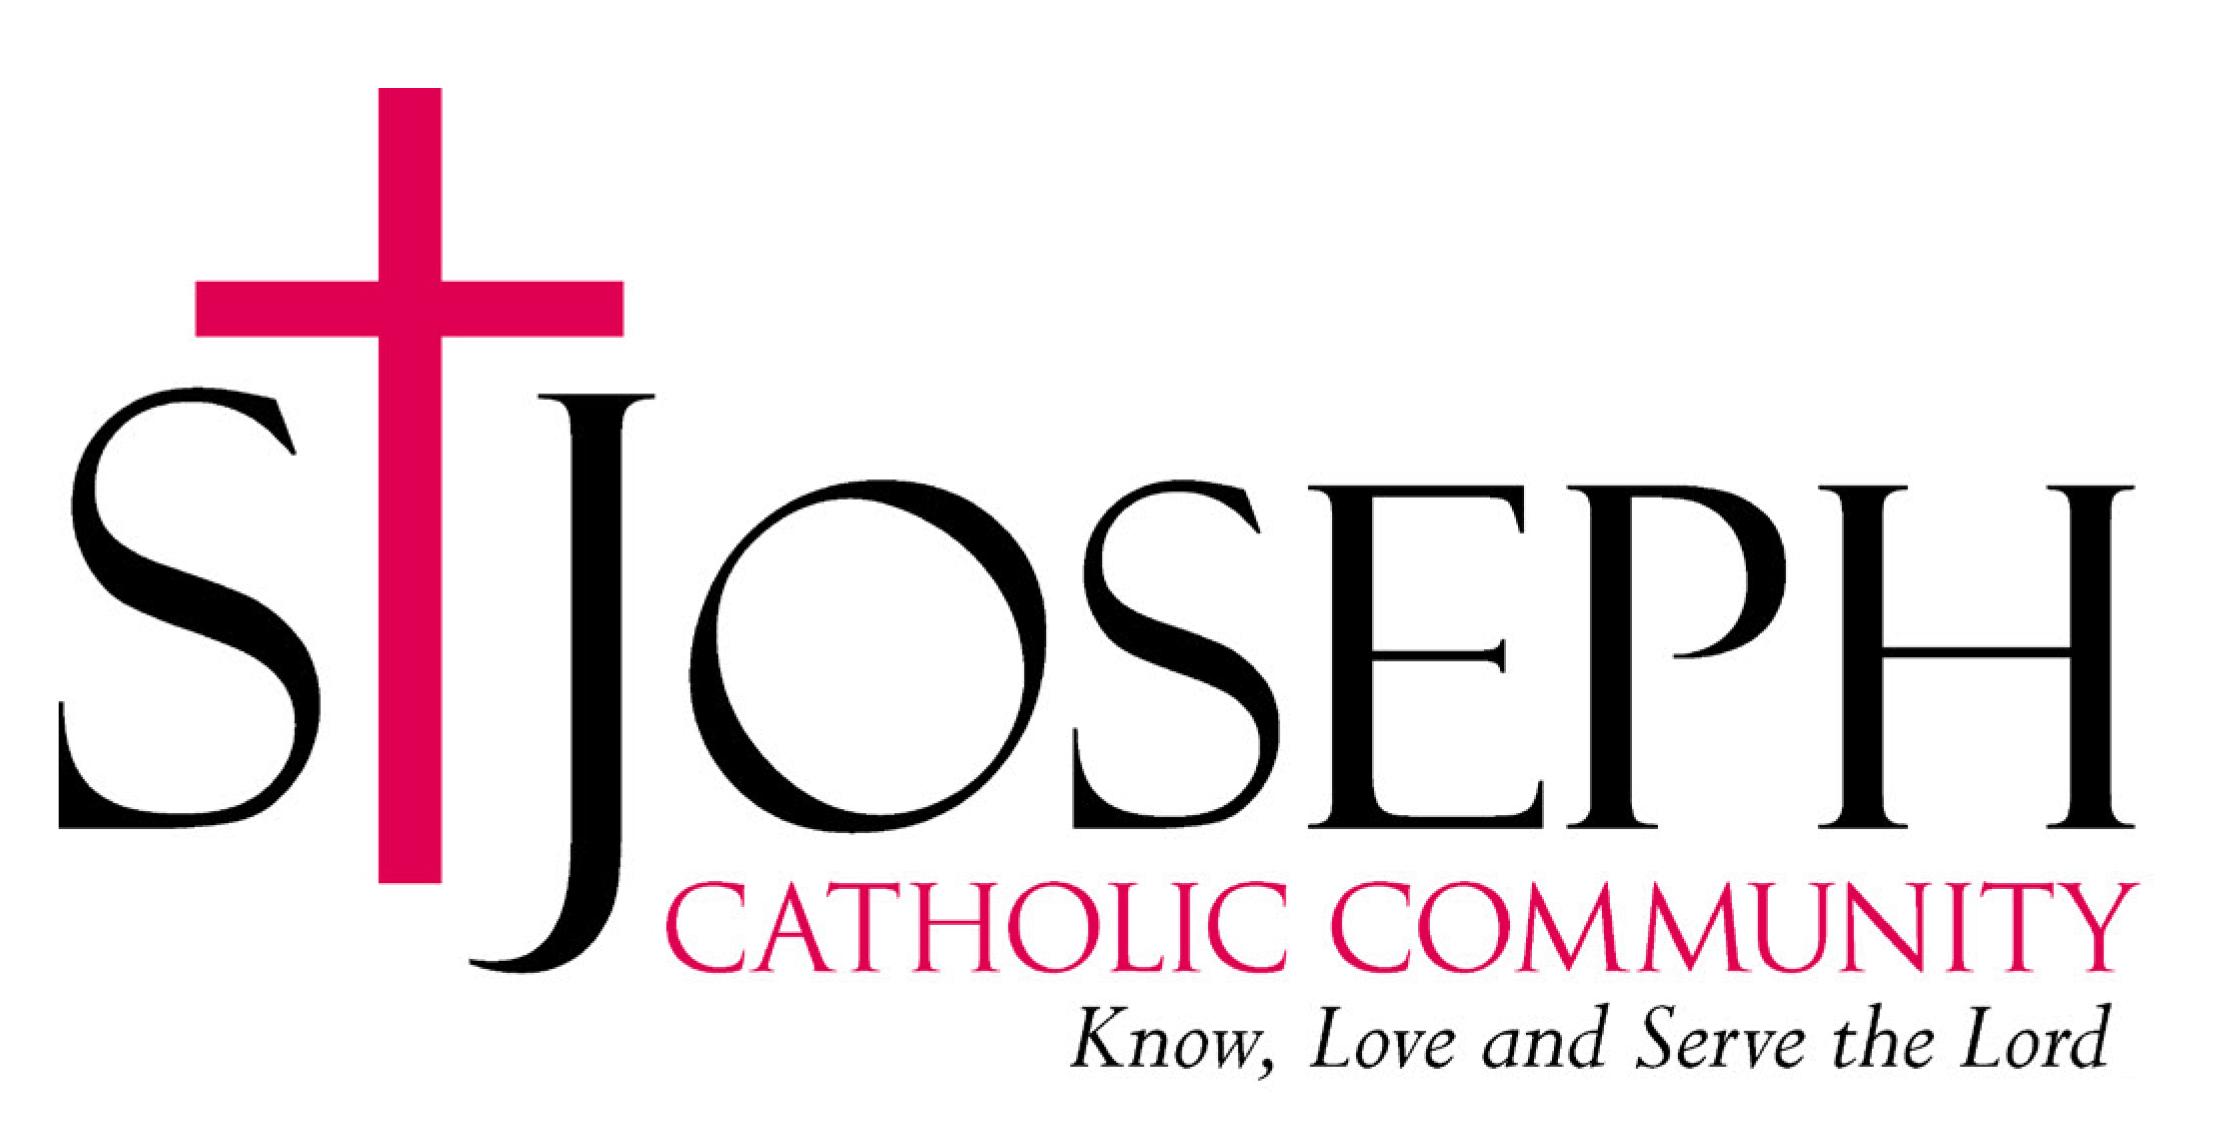 St. Joseph Catholic Community - Graphic design client of Danielle Alexander Design in Waconia, MN